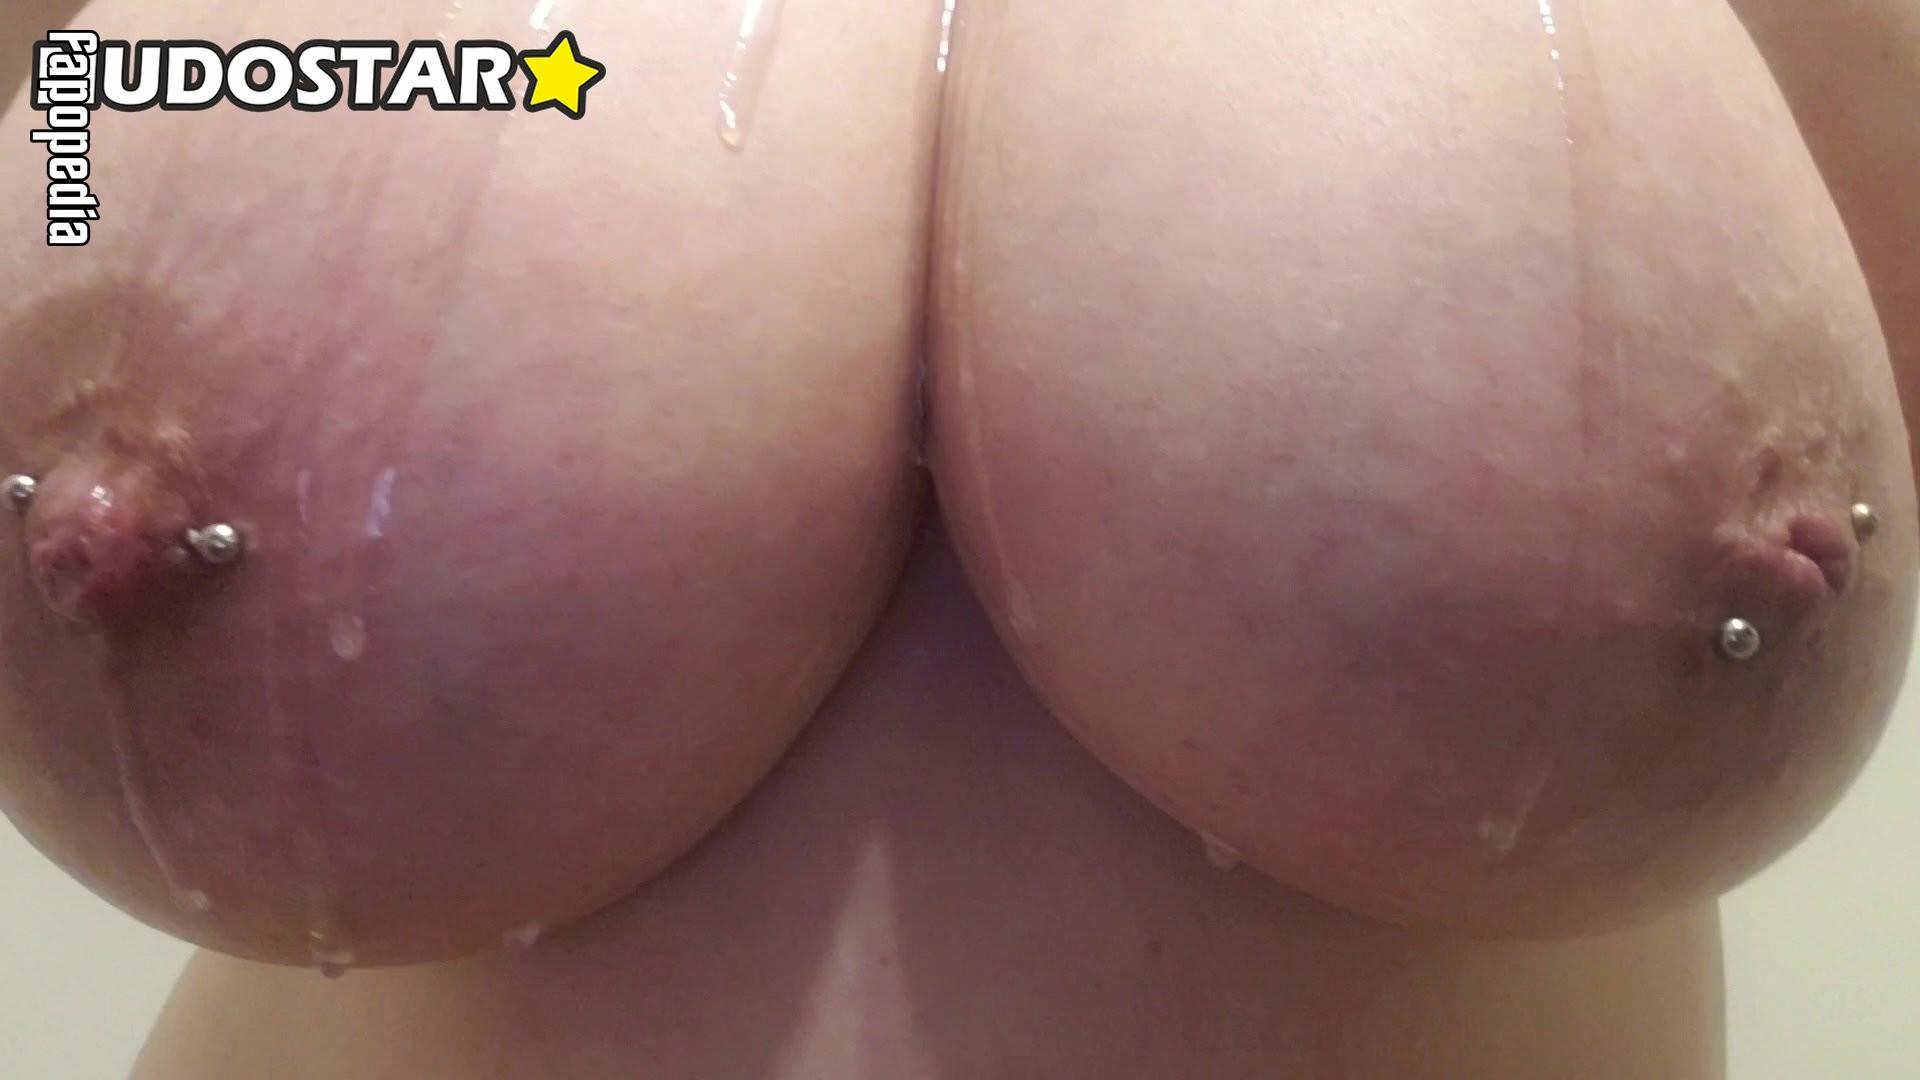 Alovelymistake29 Nude Leaks